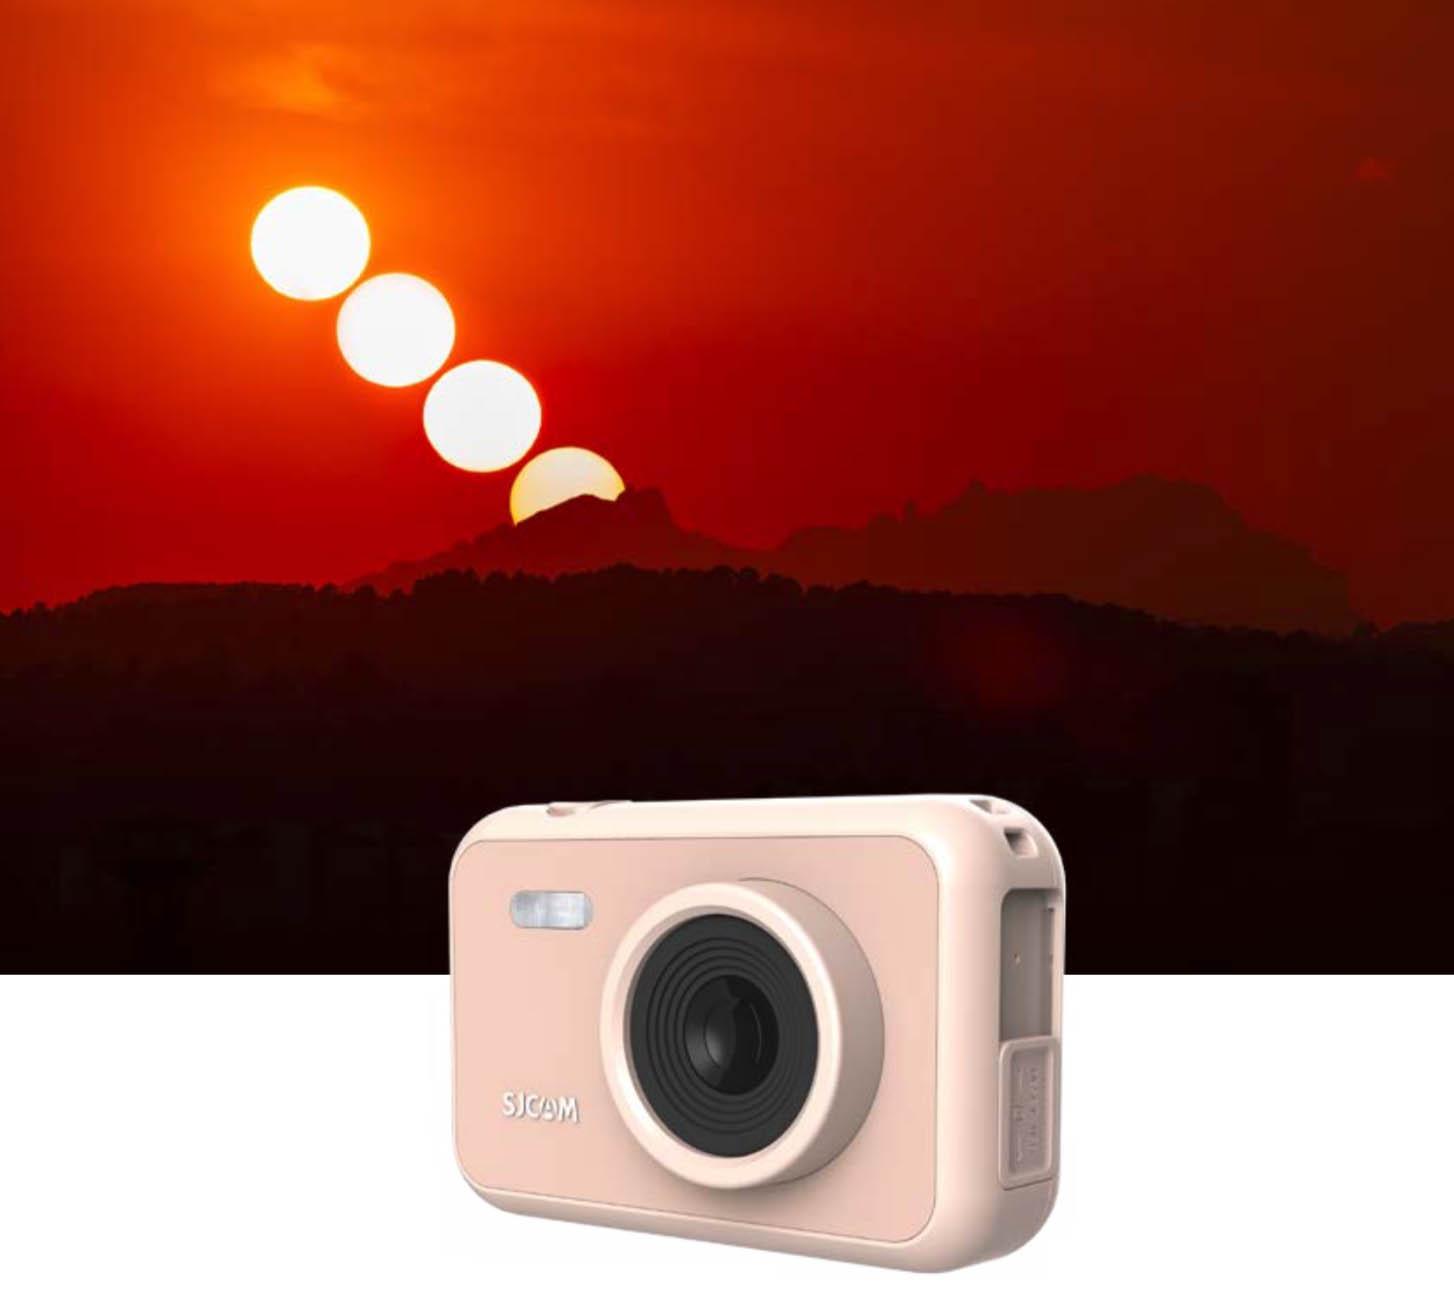 funcam-kids-hd-camera-features-4